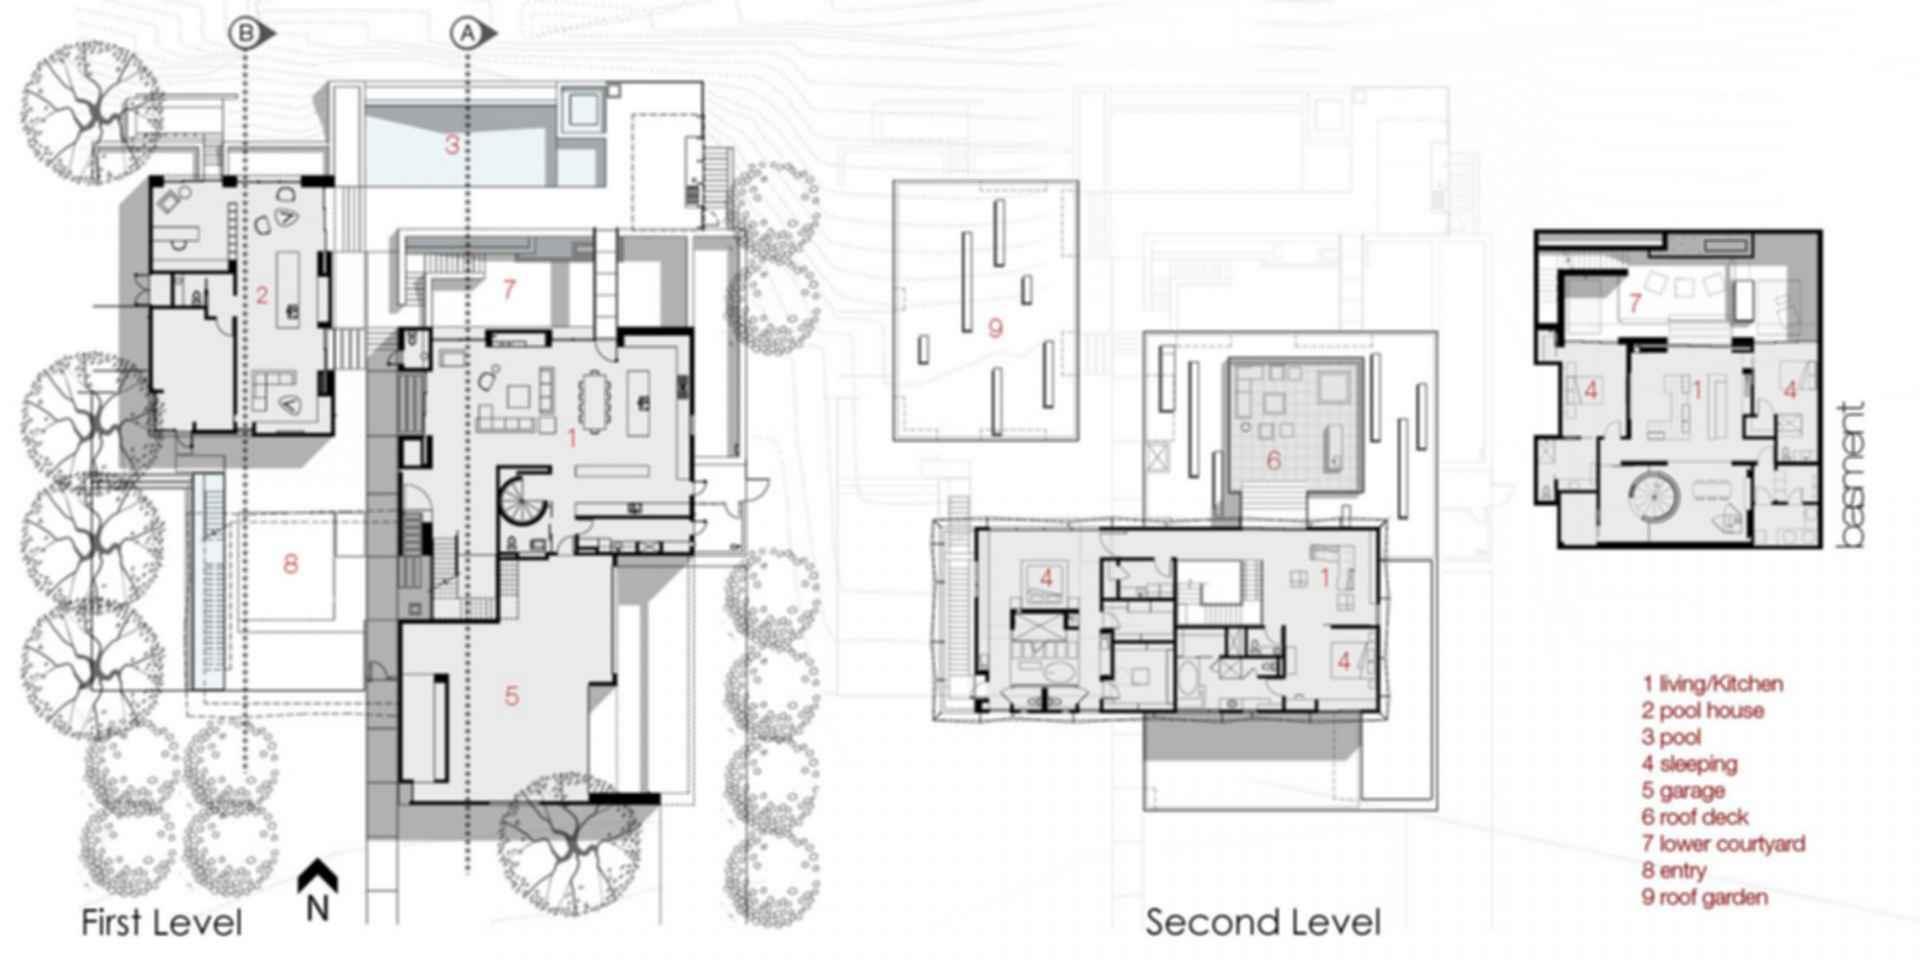 Tresarca House - Floor plan